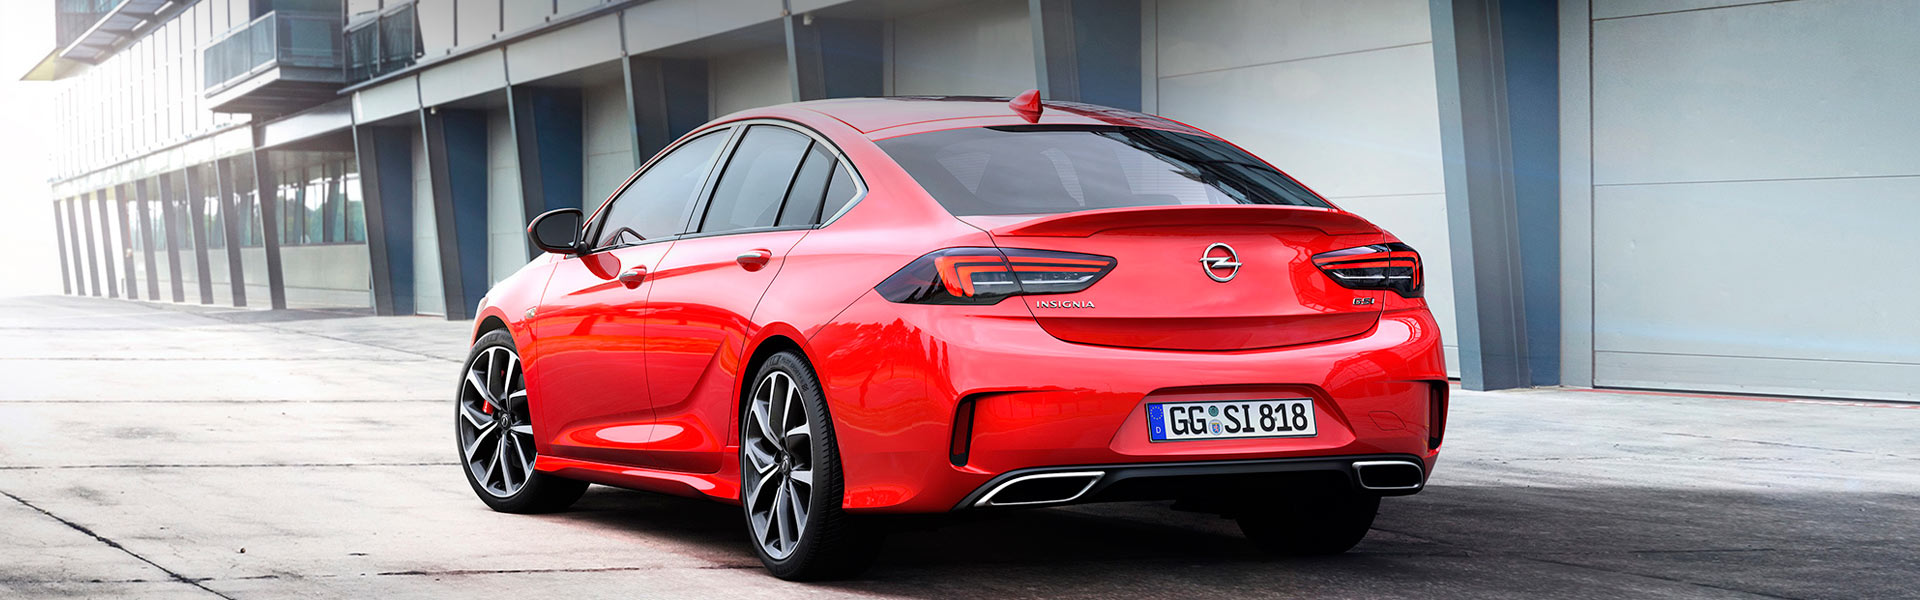 Замена опоры стойки Opel